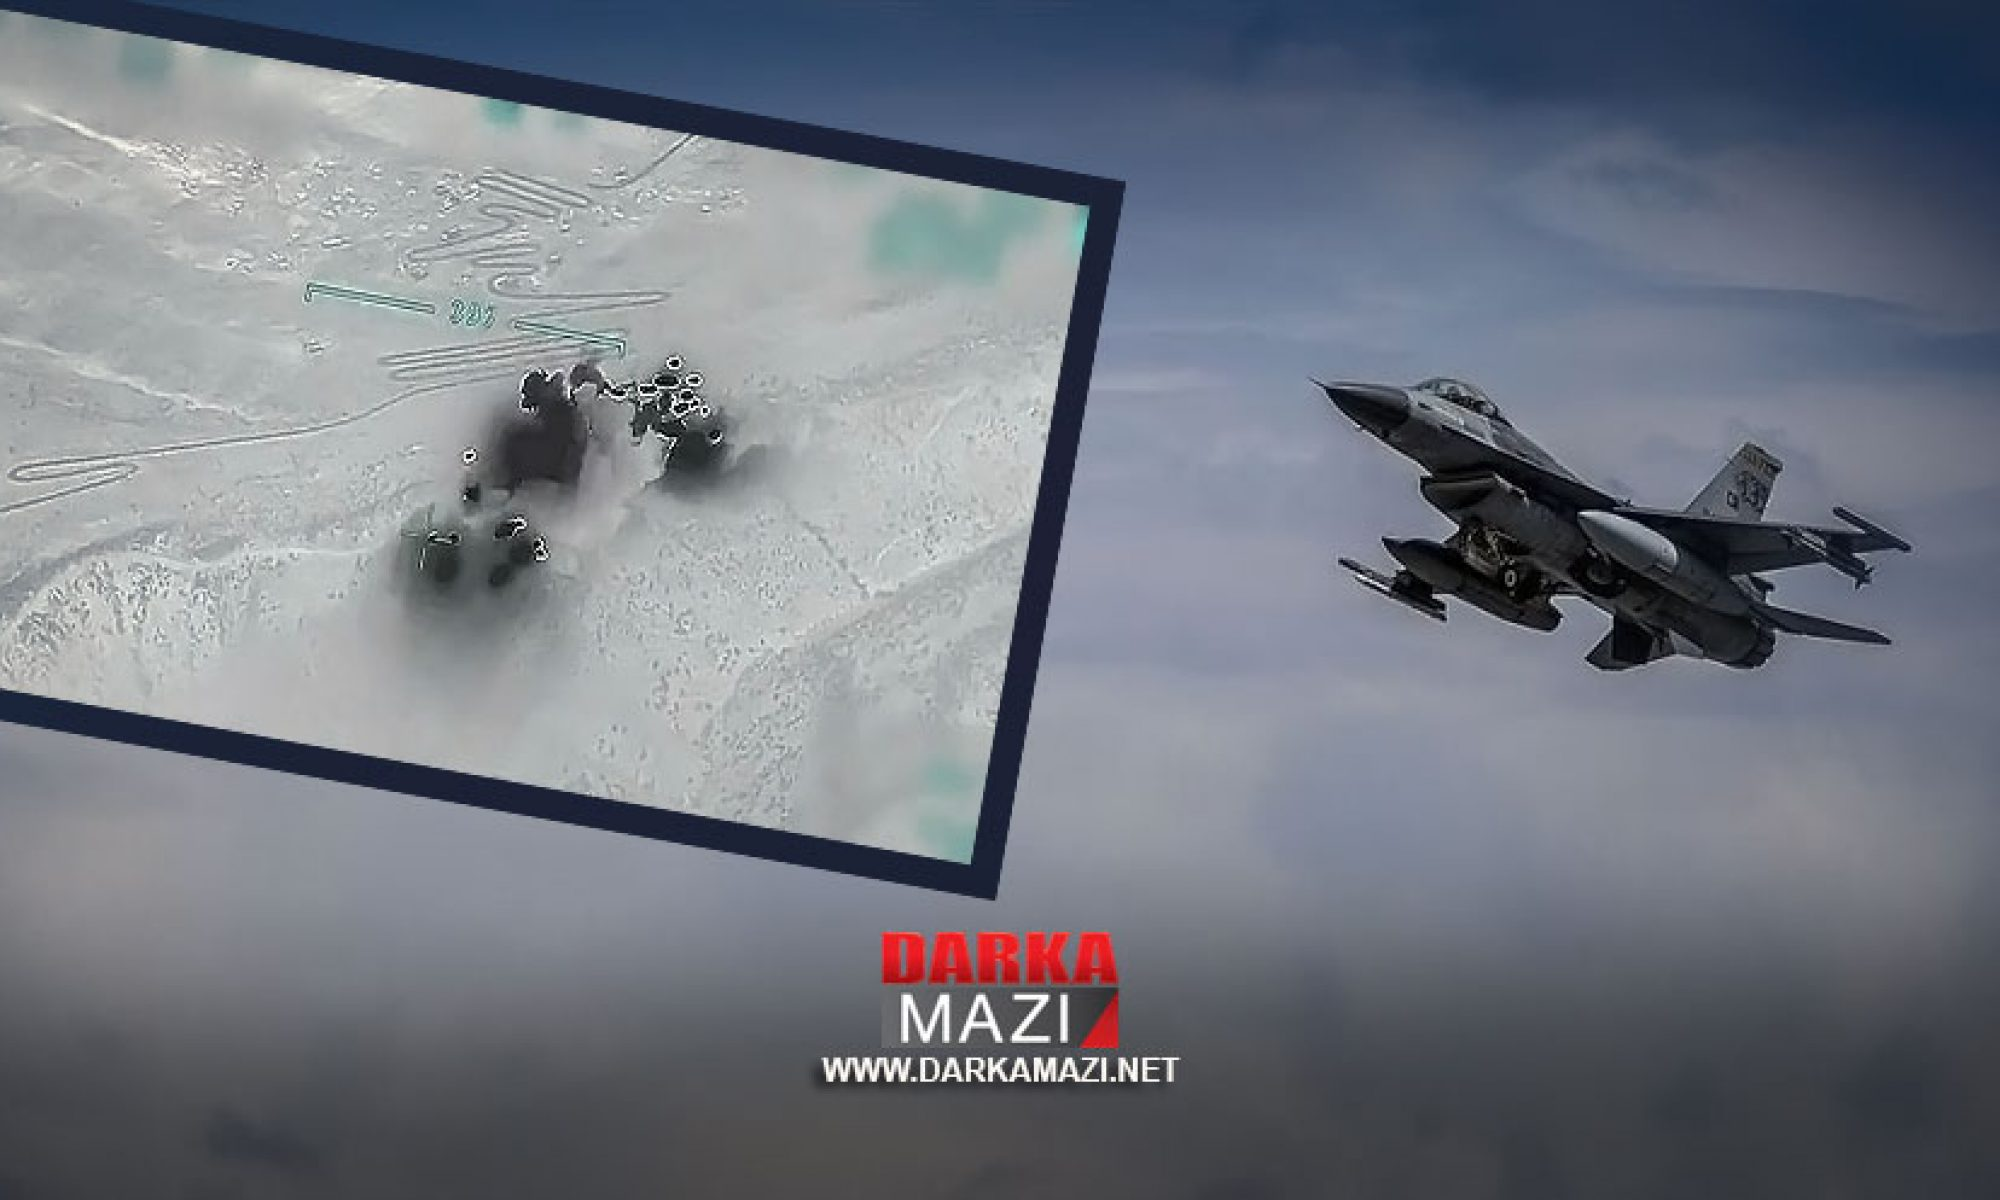 Türk savaş uçakları Qeledizê'nin bir köyünü defalarca bombaladı